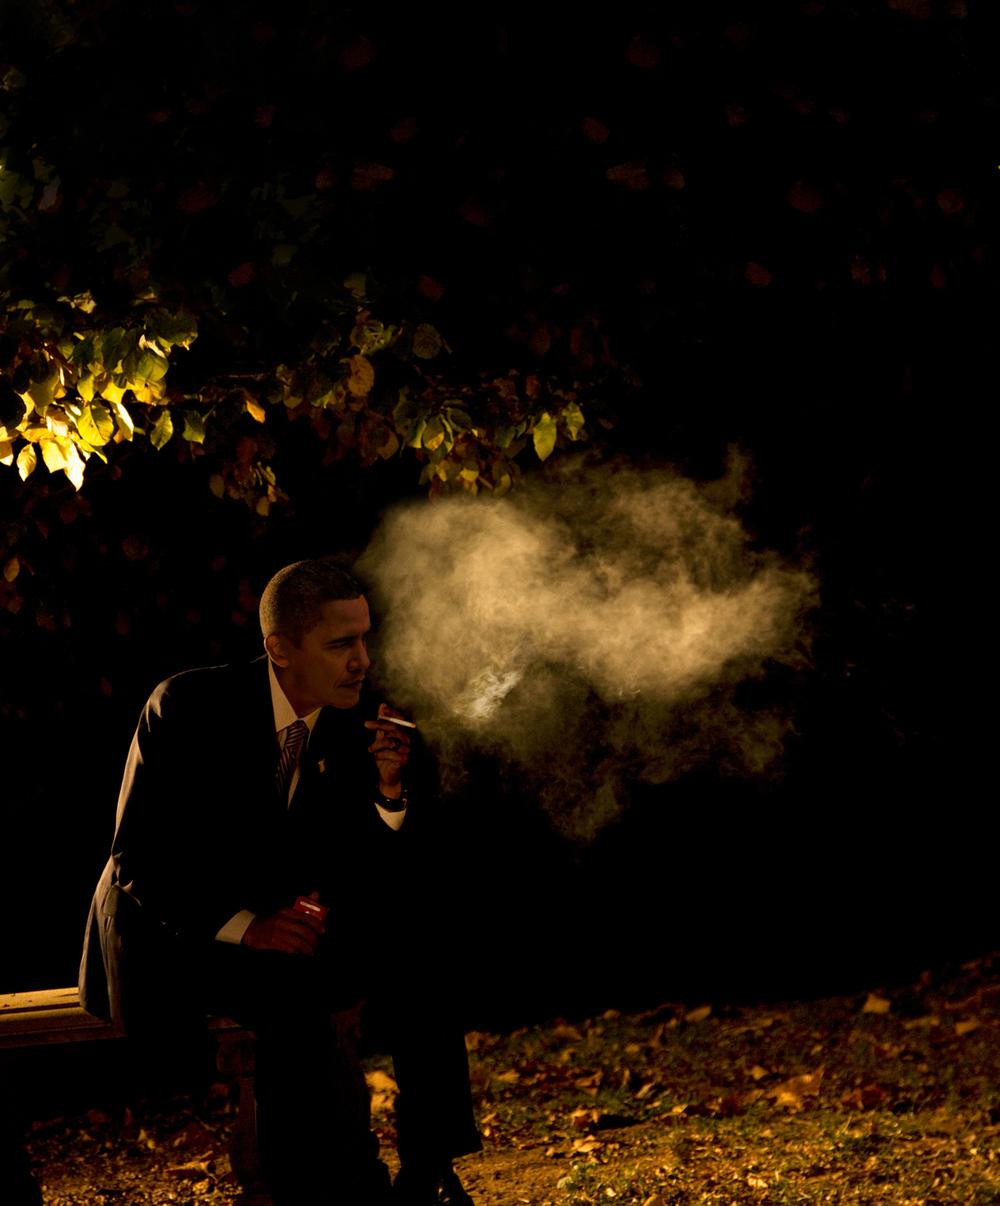 Obama Smoking 2012